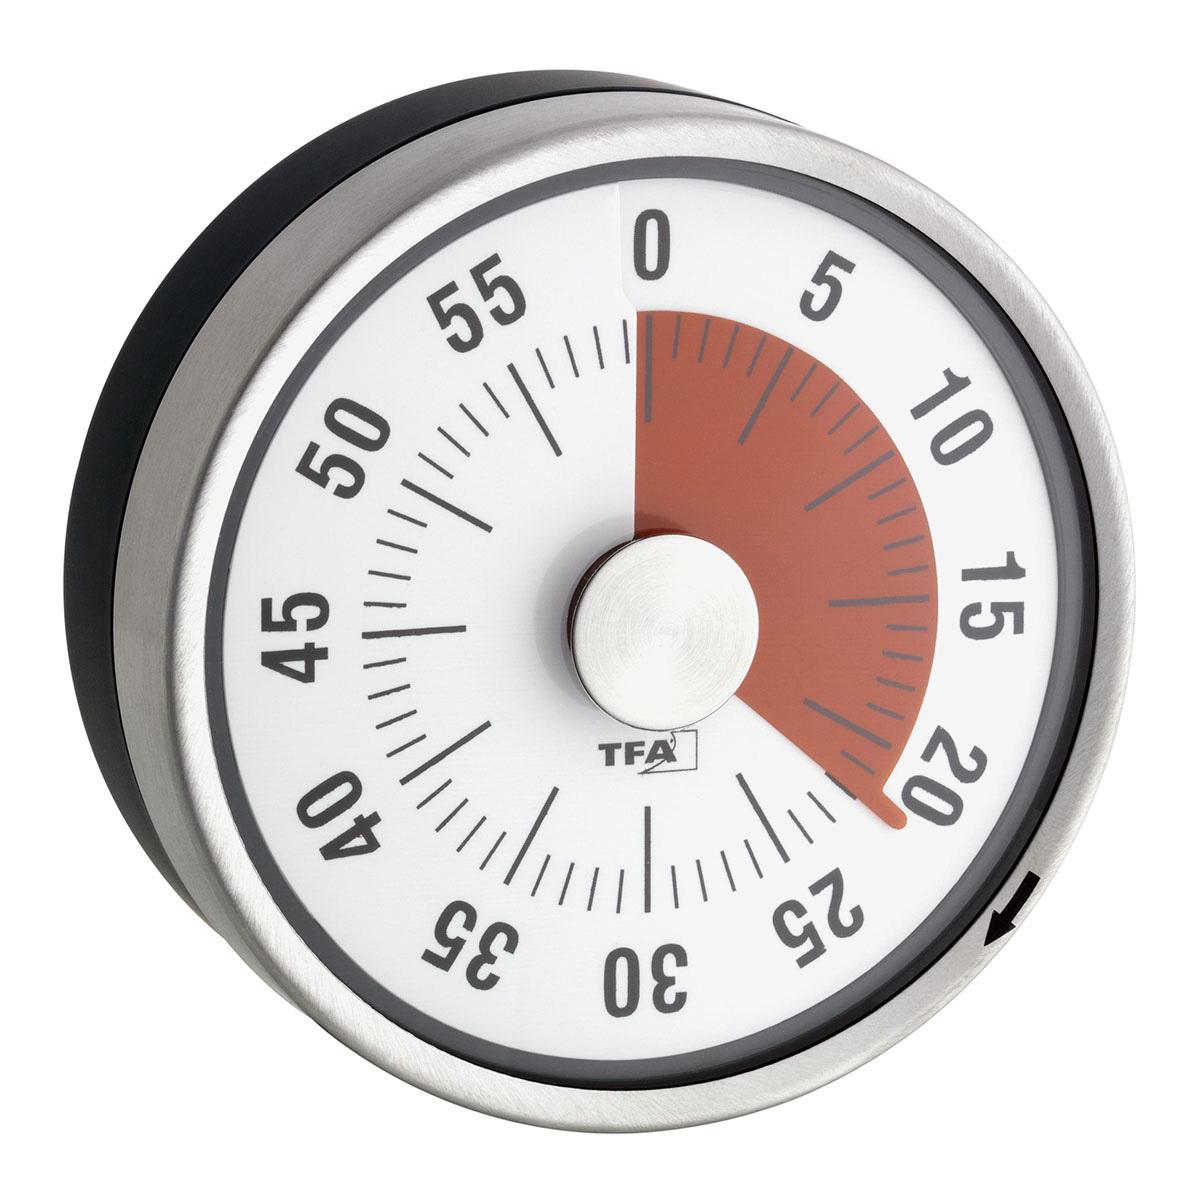 38-1028-10-analoger-küchen-timer-puck-anwendung-1200x1200px.jpg